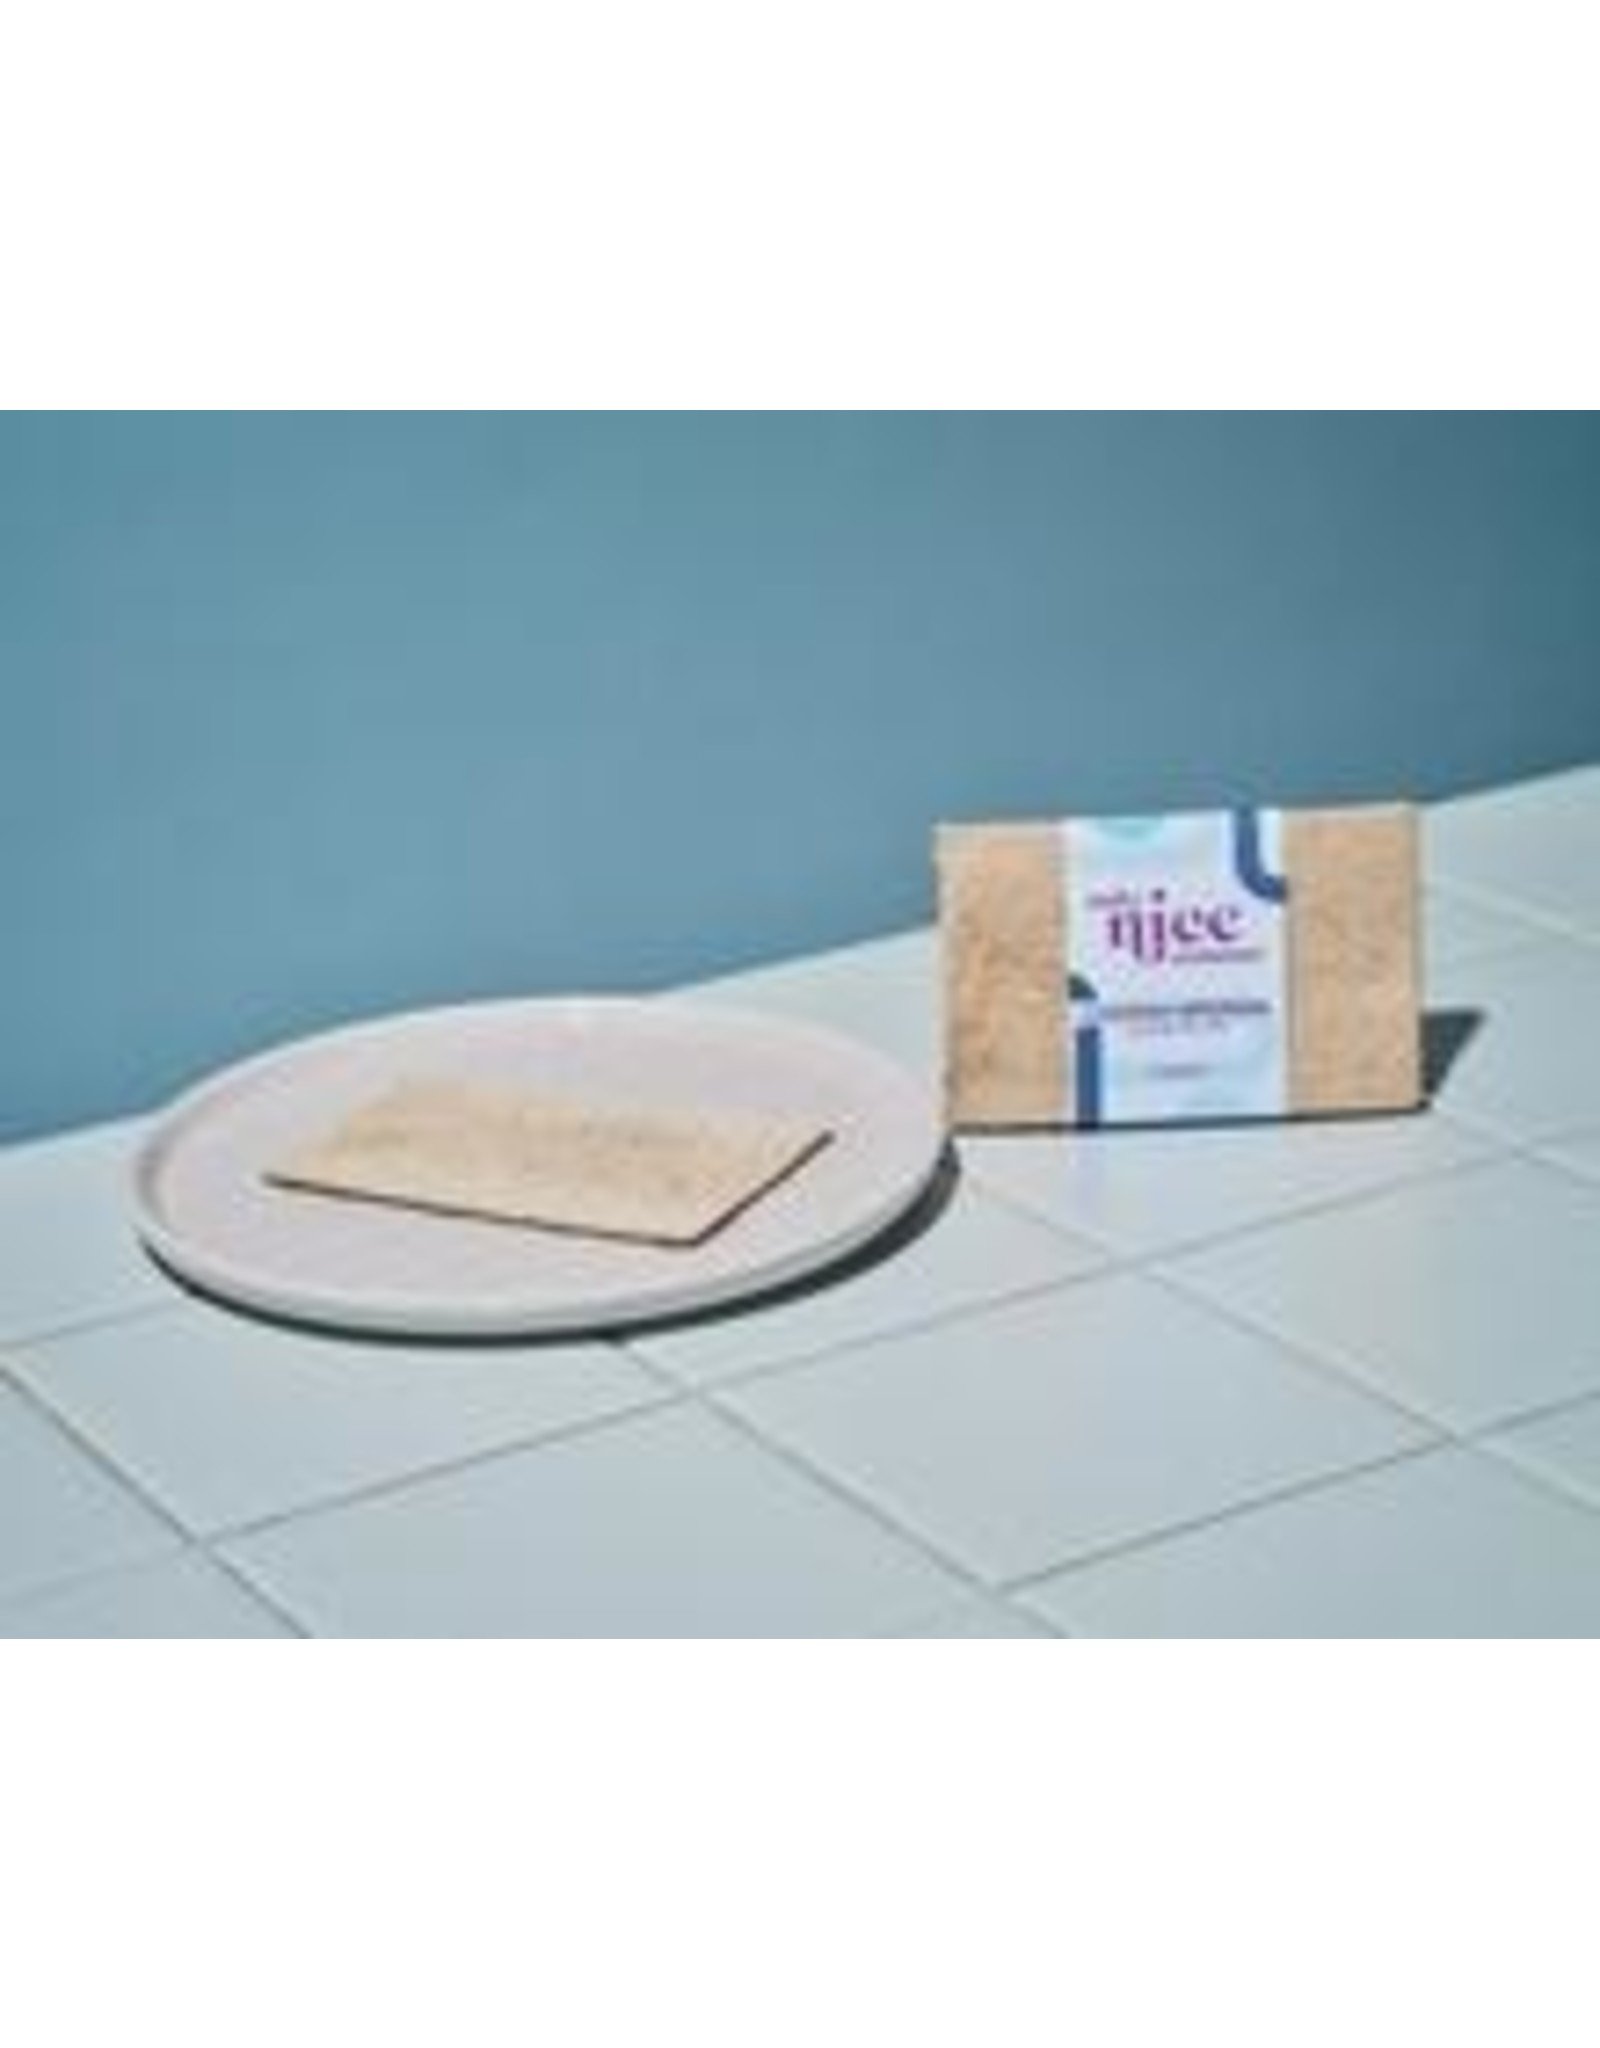 Make Nice Company 3-pack Kitchen Loofah by Make Nice Company